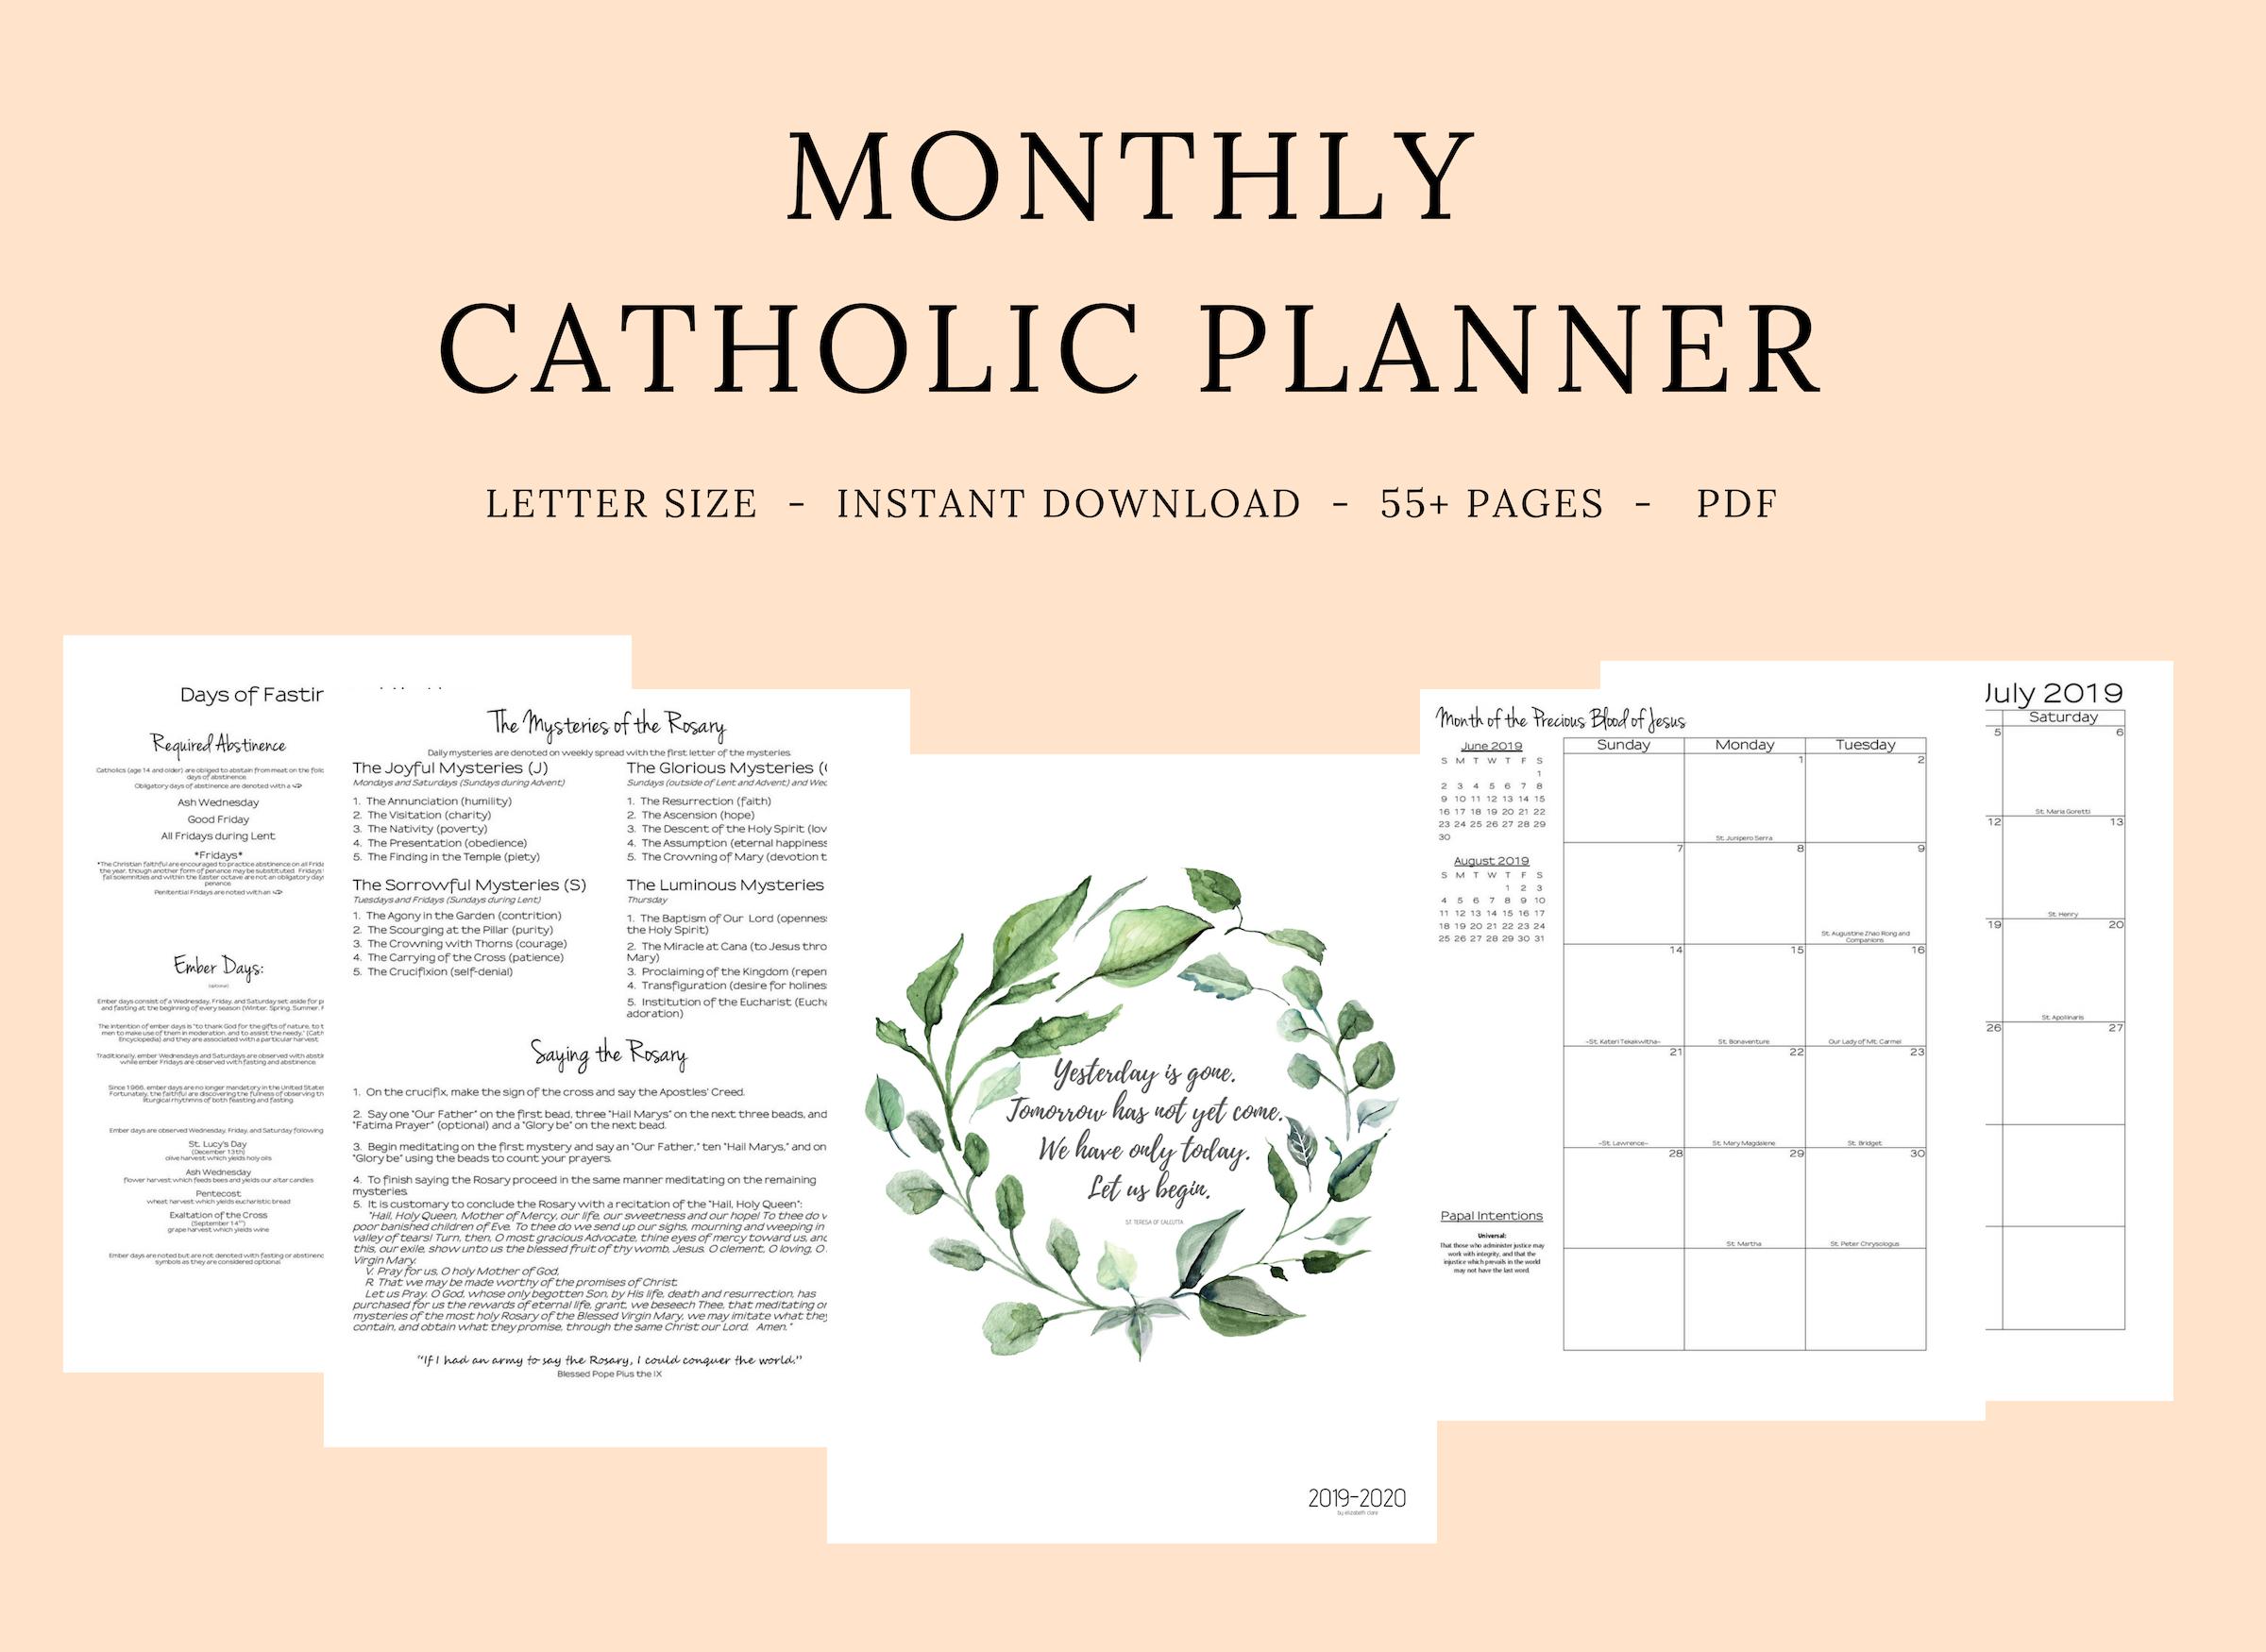 2019- 2020 Catholic Monthly Planner